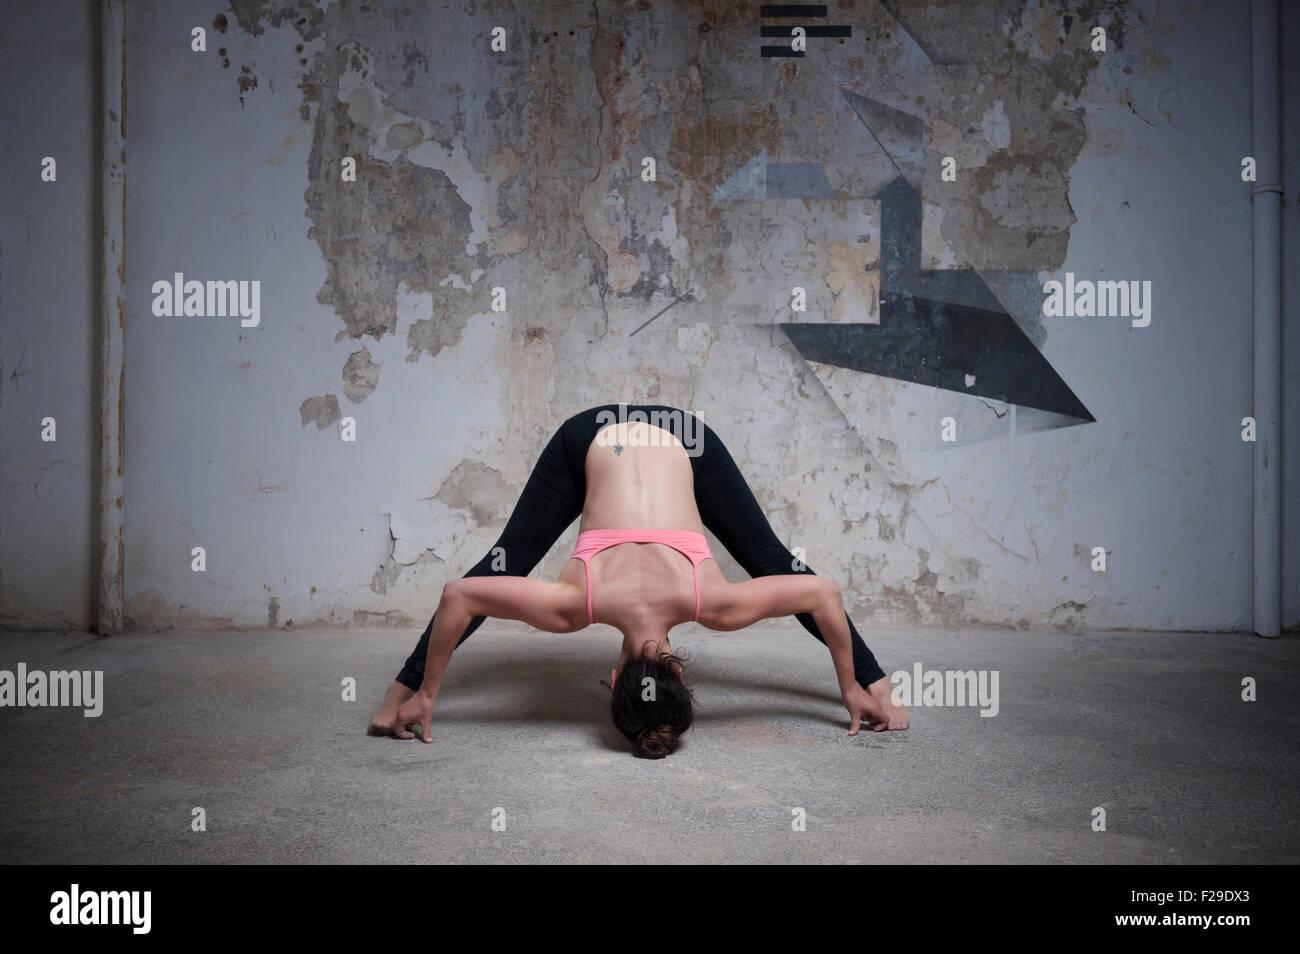 yoga stockfotos yoga bilder alamy. Black Bedroom Furniture Sets. Home Design Ideas